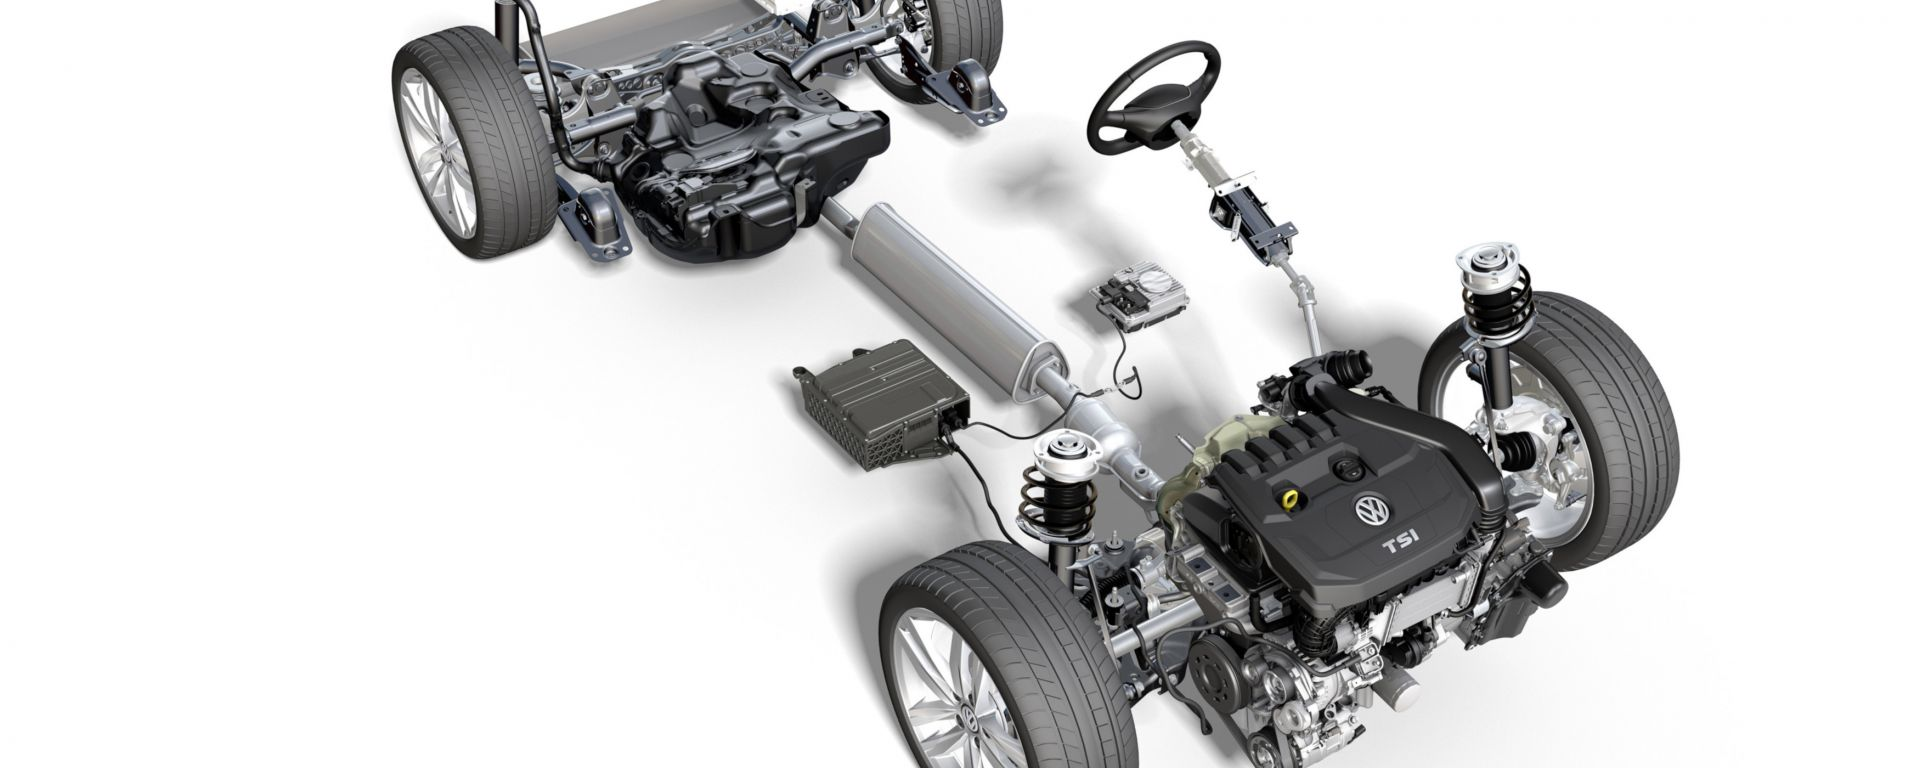 Nuova Volkswagen Golf 2020, piattaforma mild hybrid 48 Volt